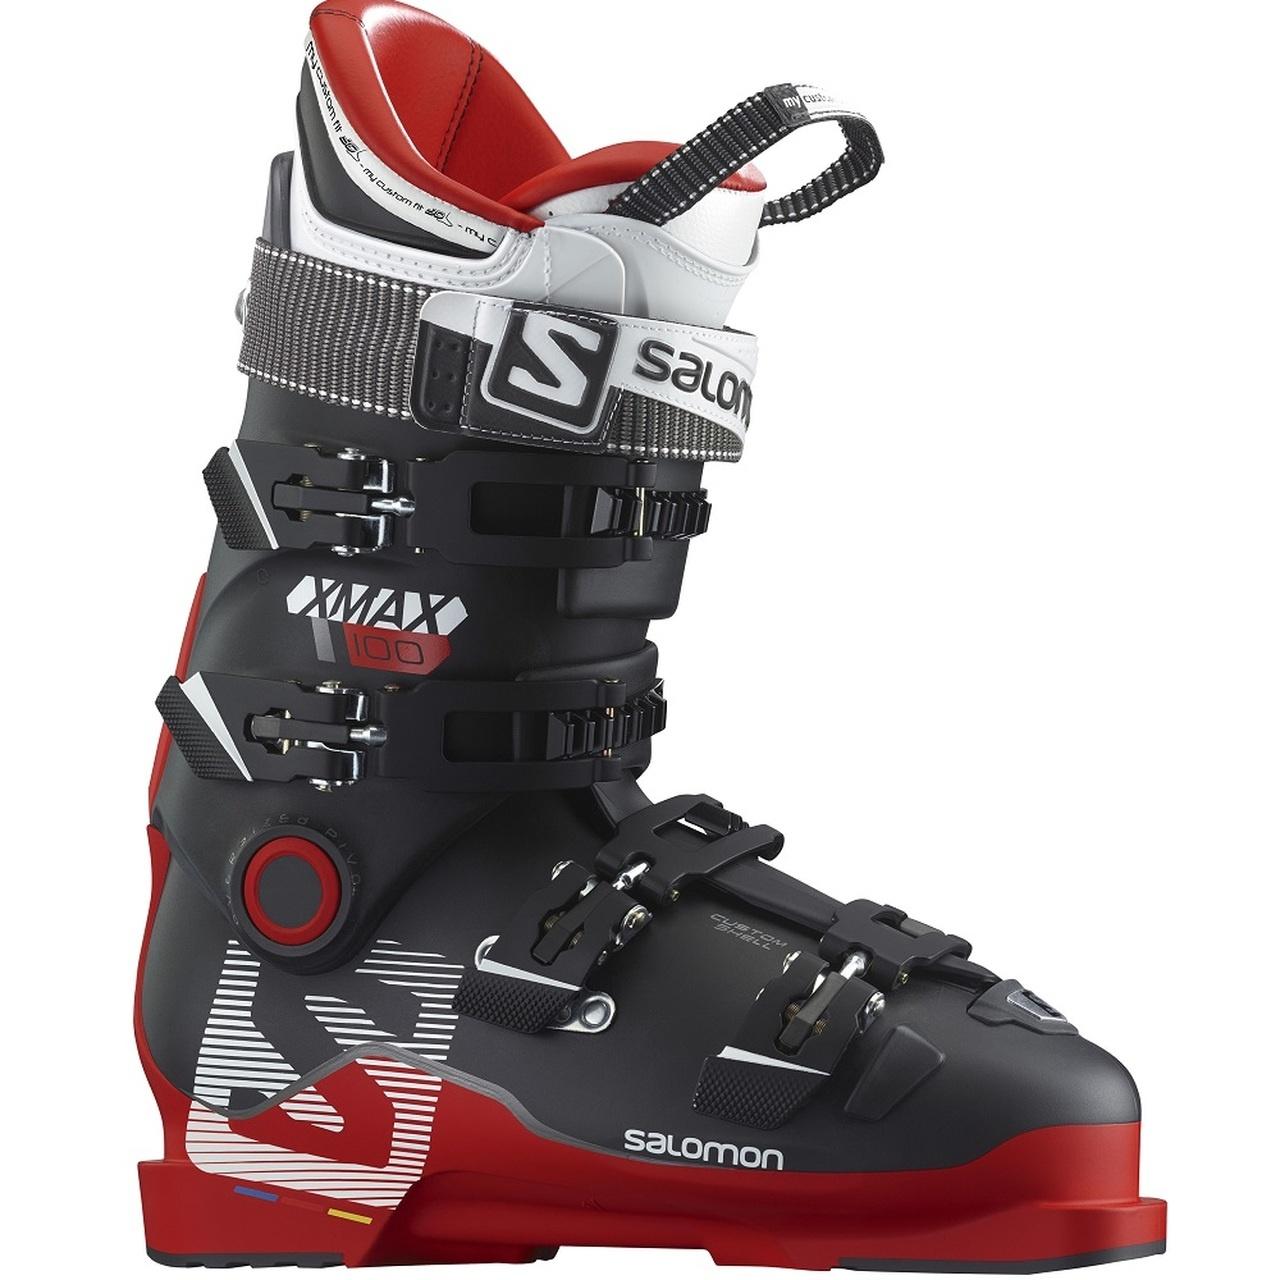 Salomon X-Max 100 Red-Black